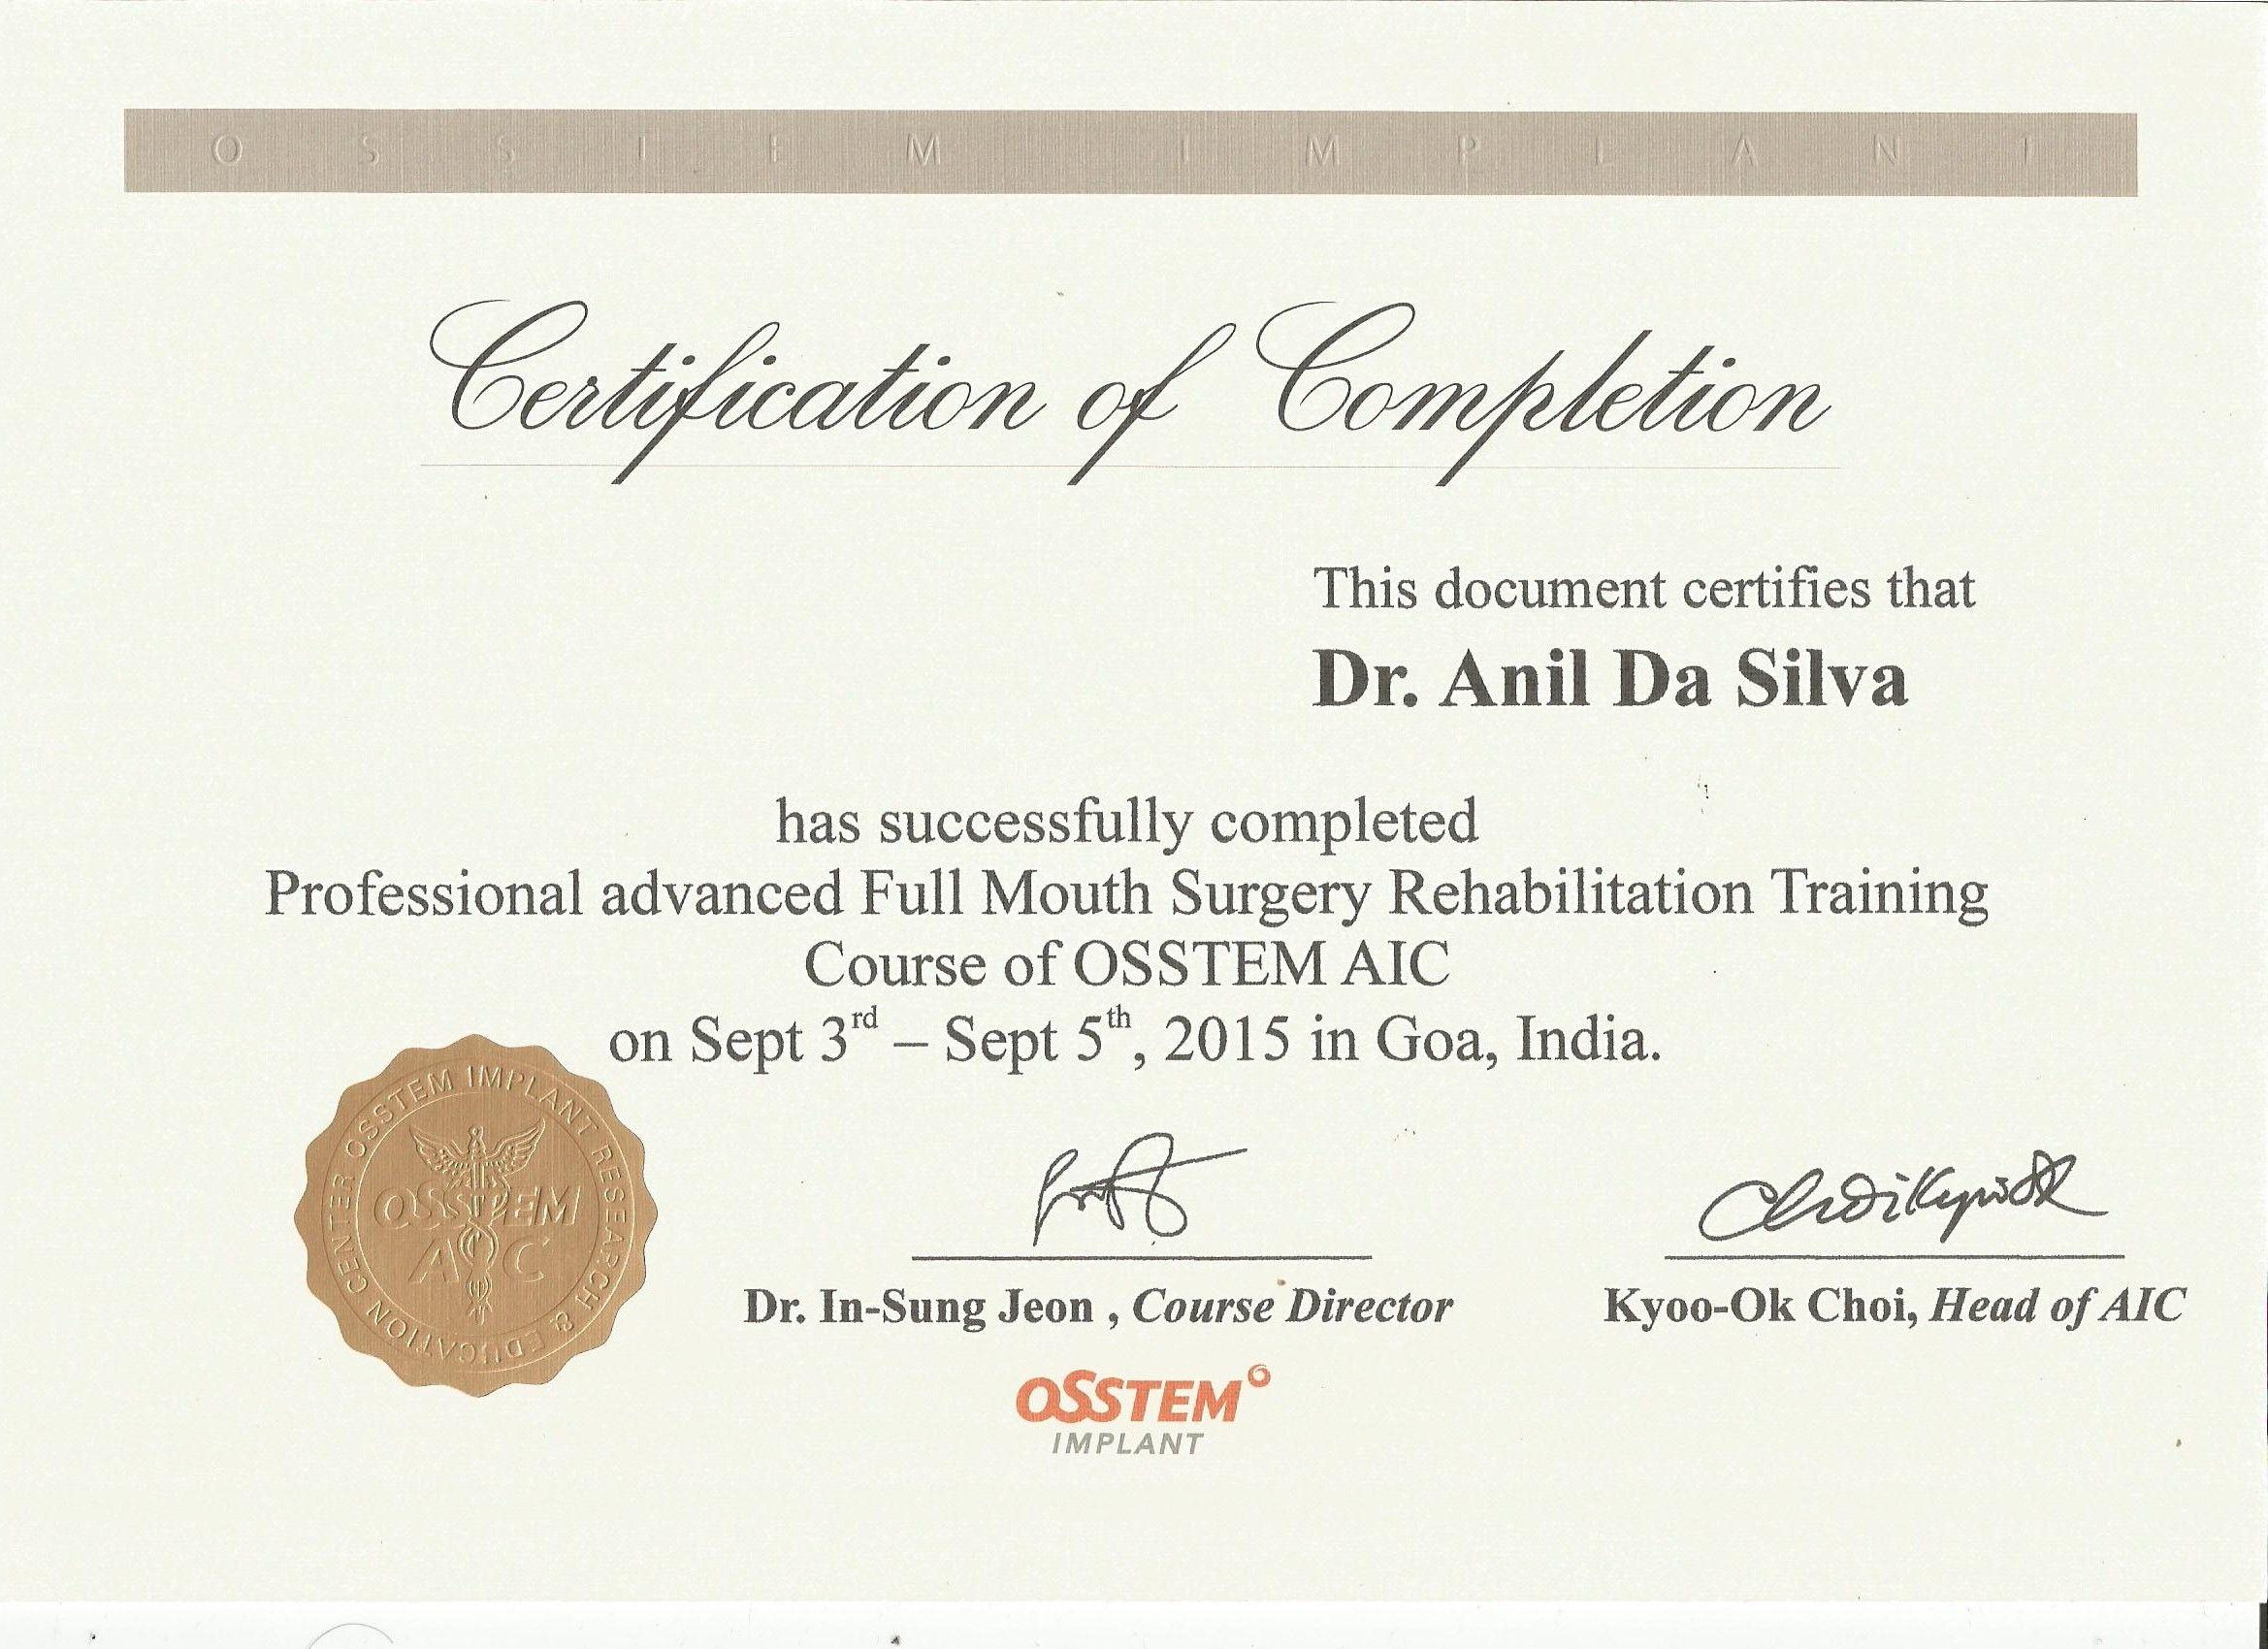 Course of OSSTEM AIC 2015 | certificates | Pinterest | Certificate